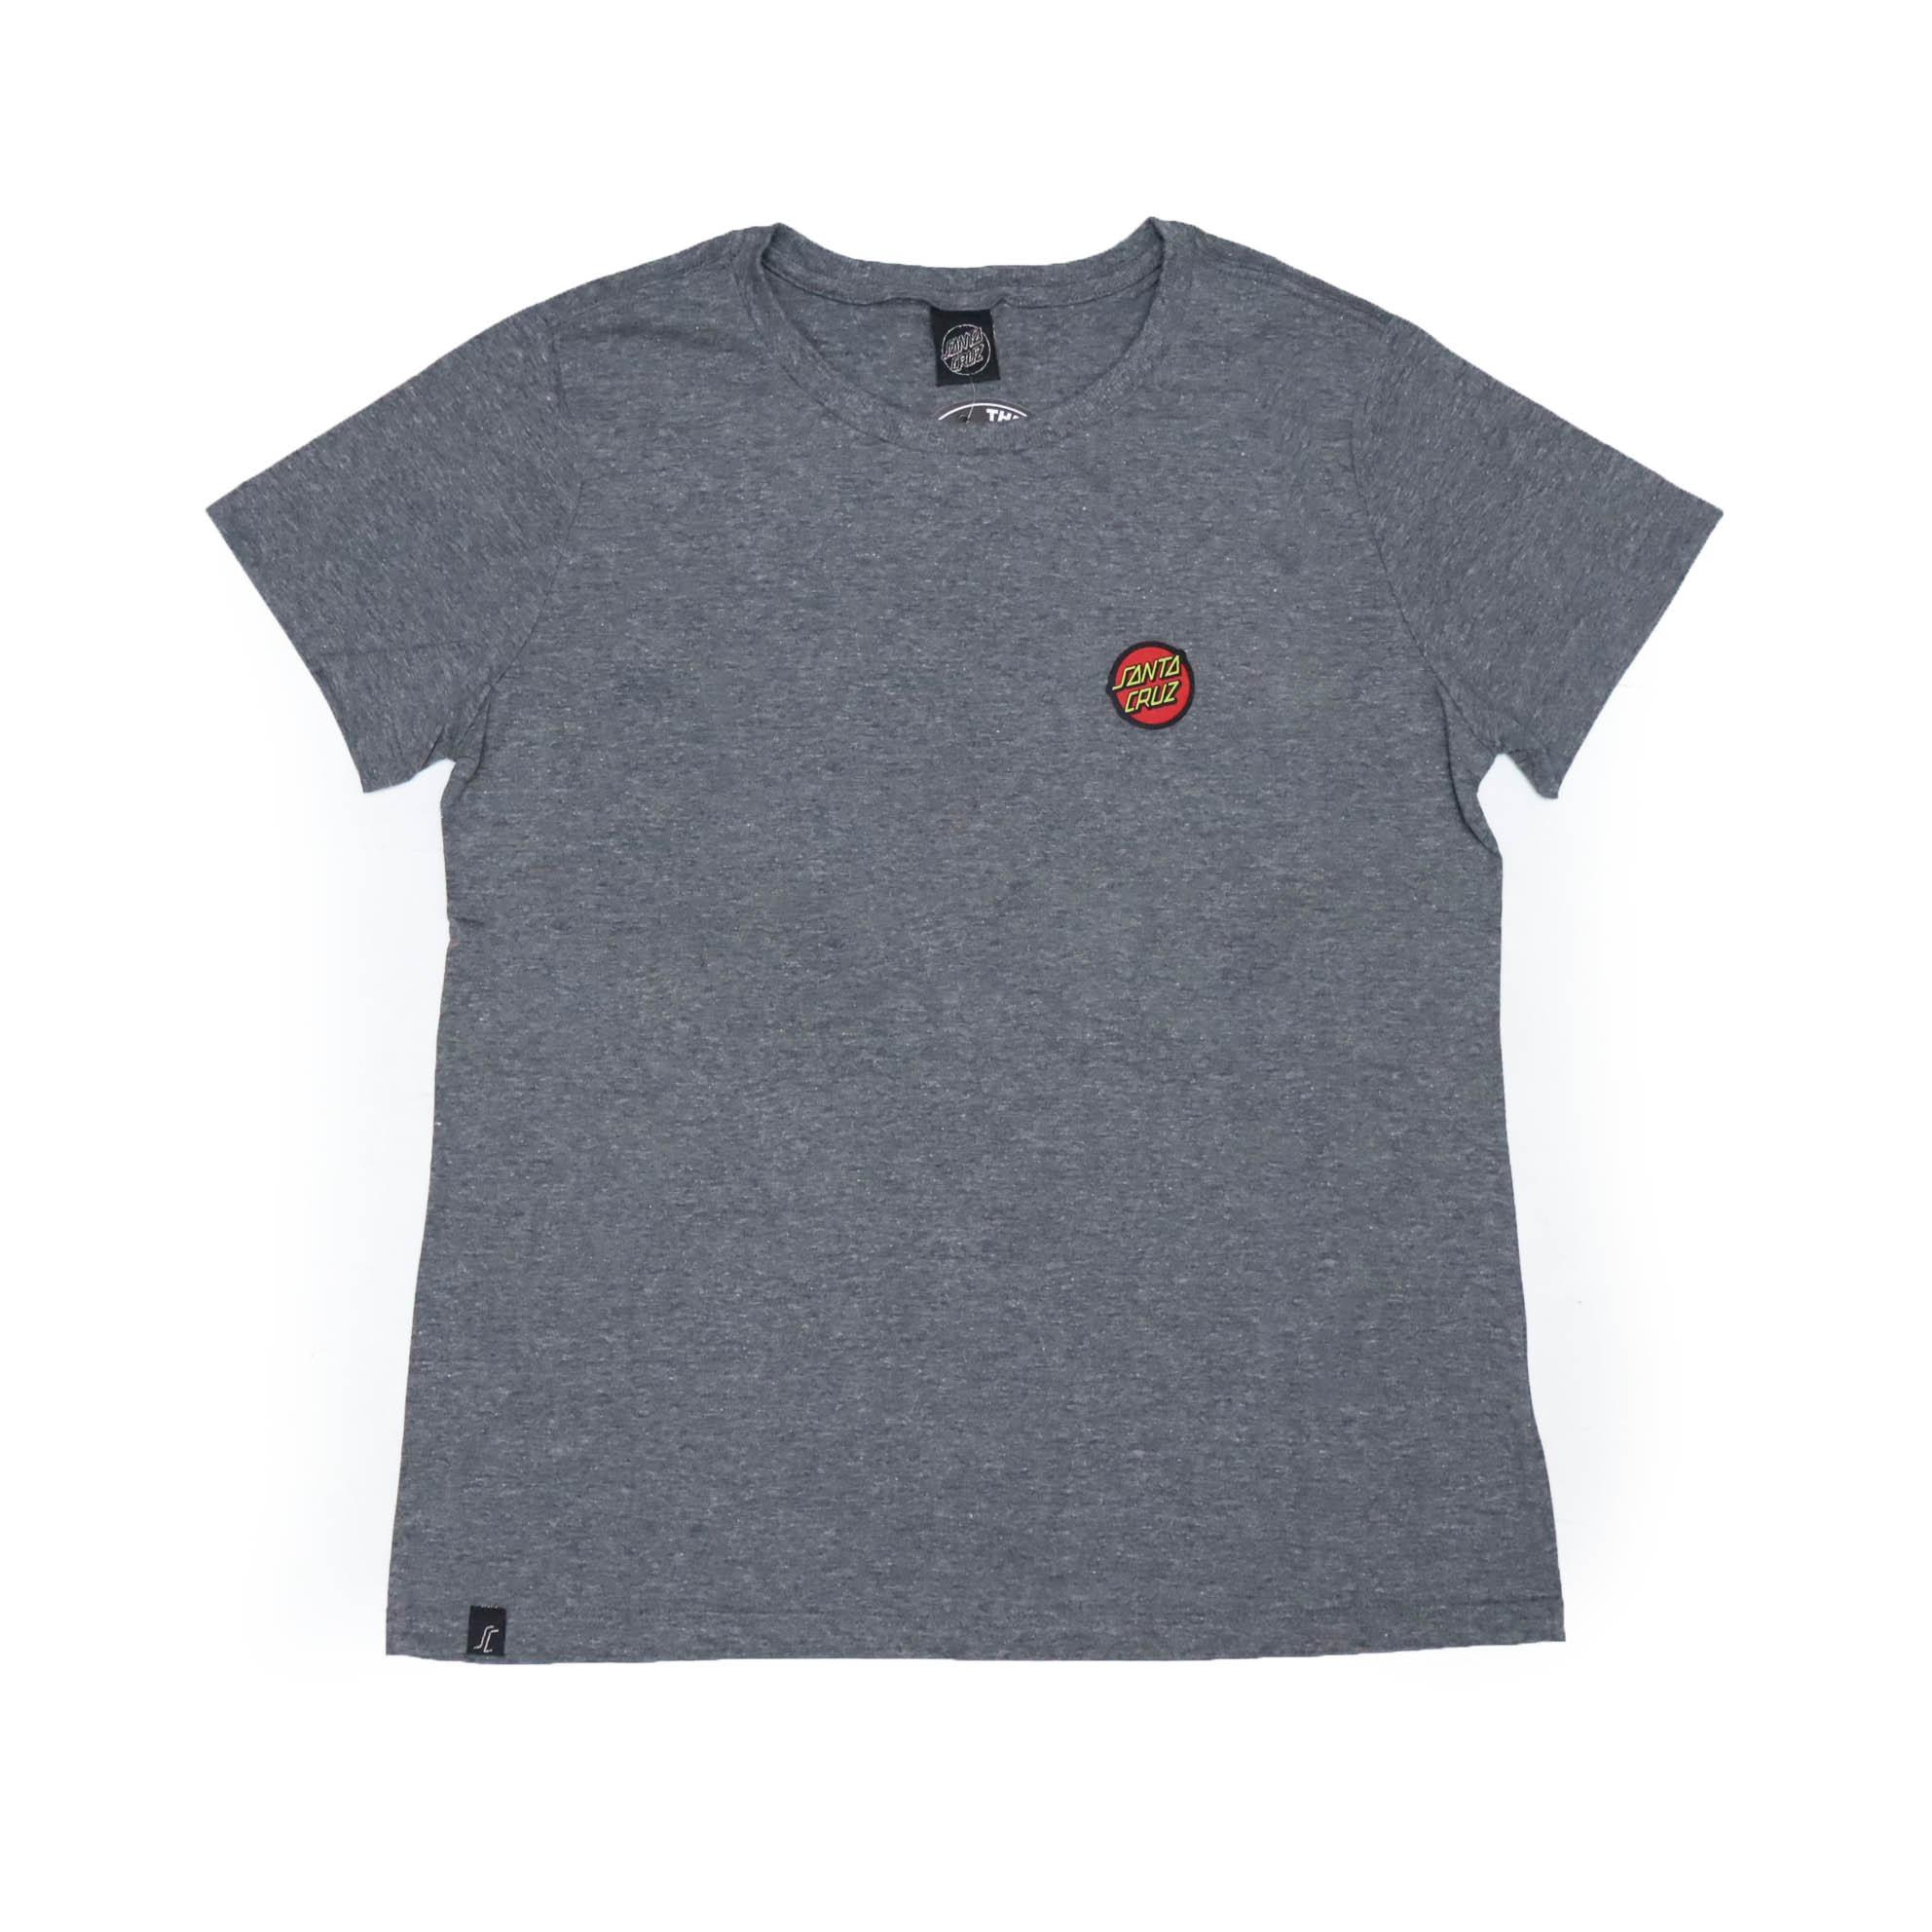 Camiseta Feminina Santa Cruz Classic Dot Chest - Chumbo Mescla